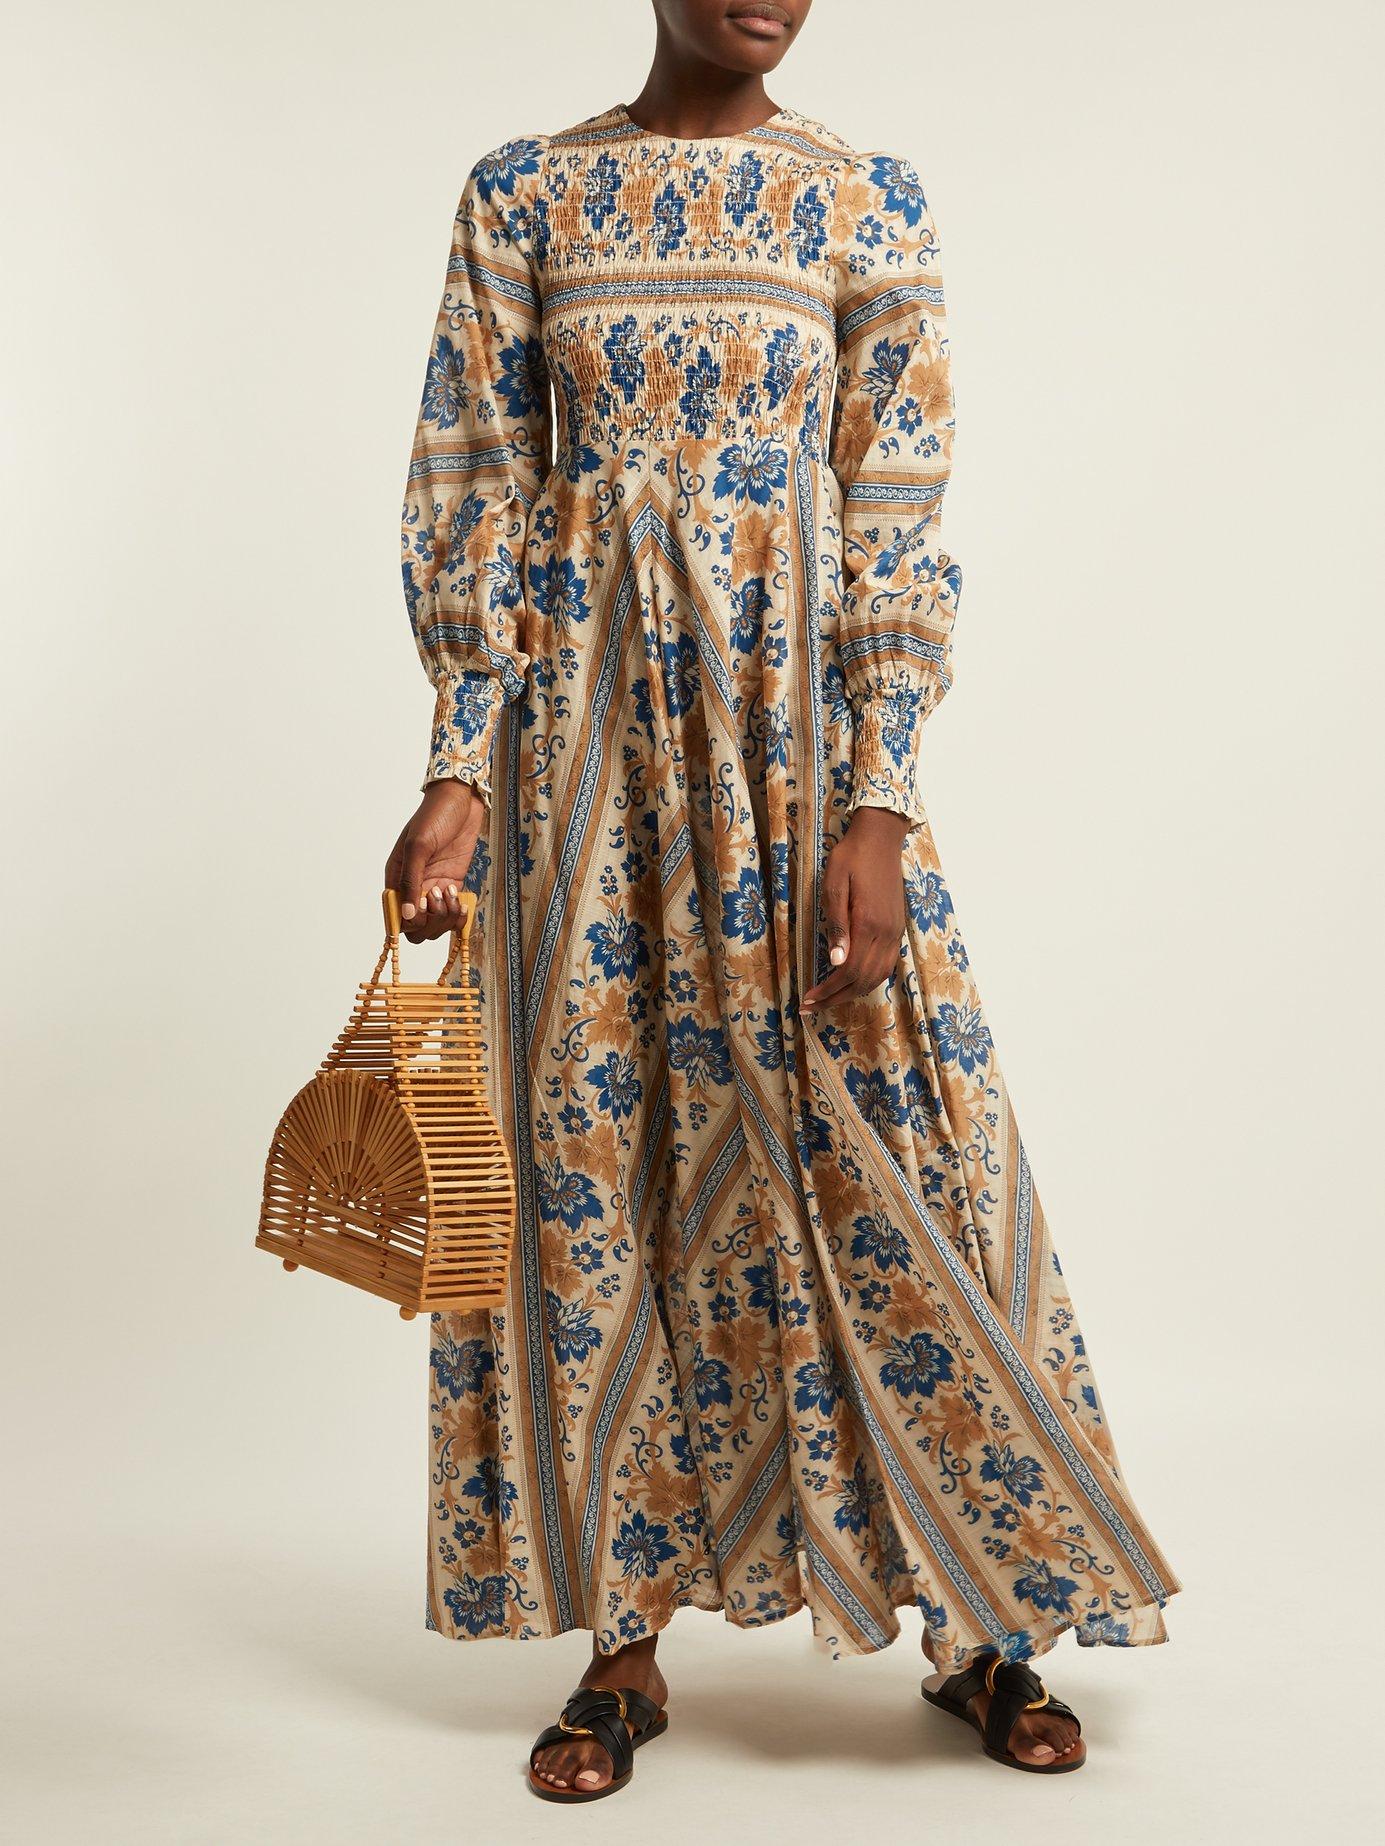 Castile smocked cotton dress by Zimmermann